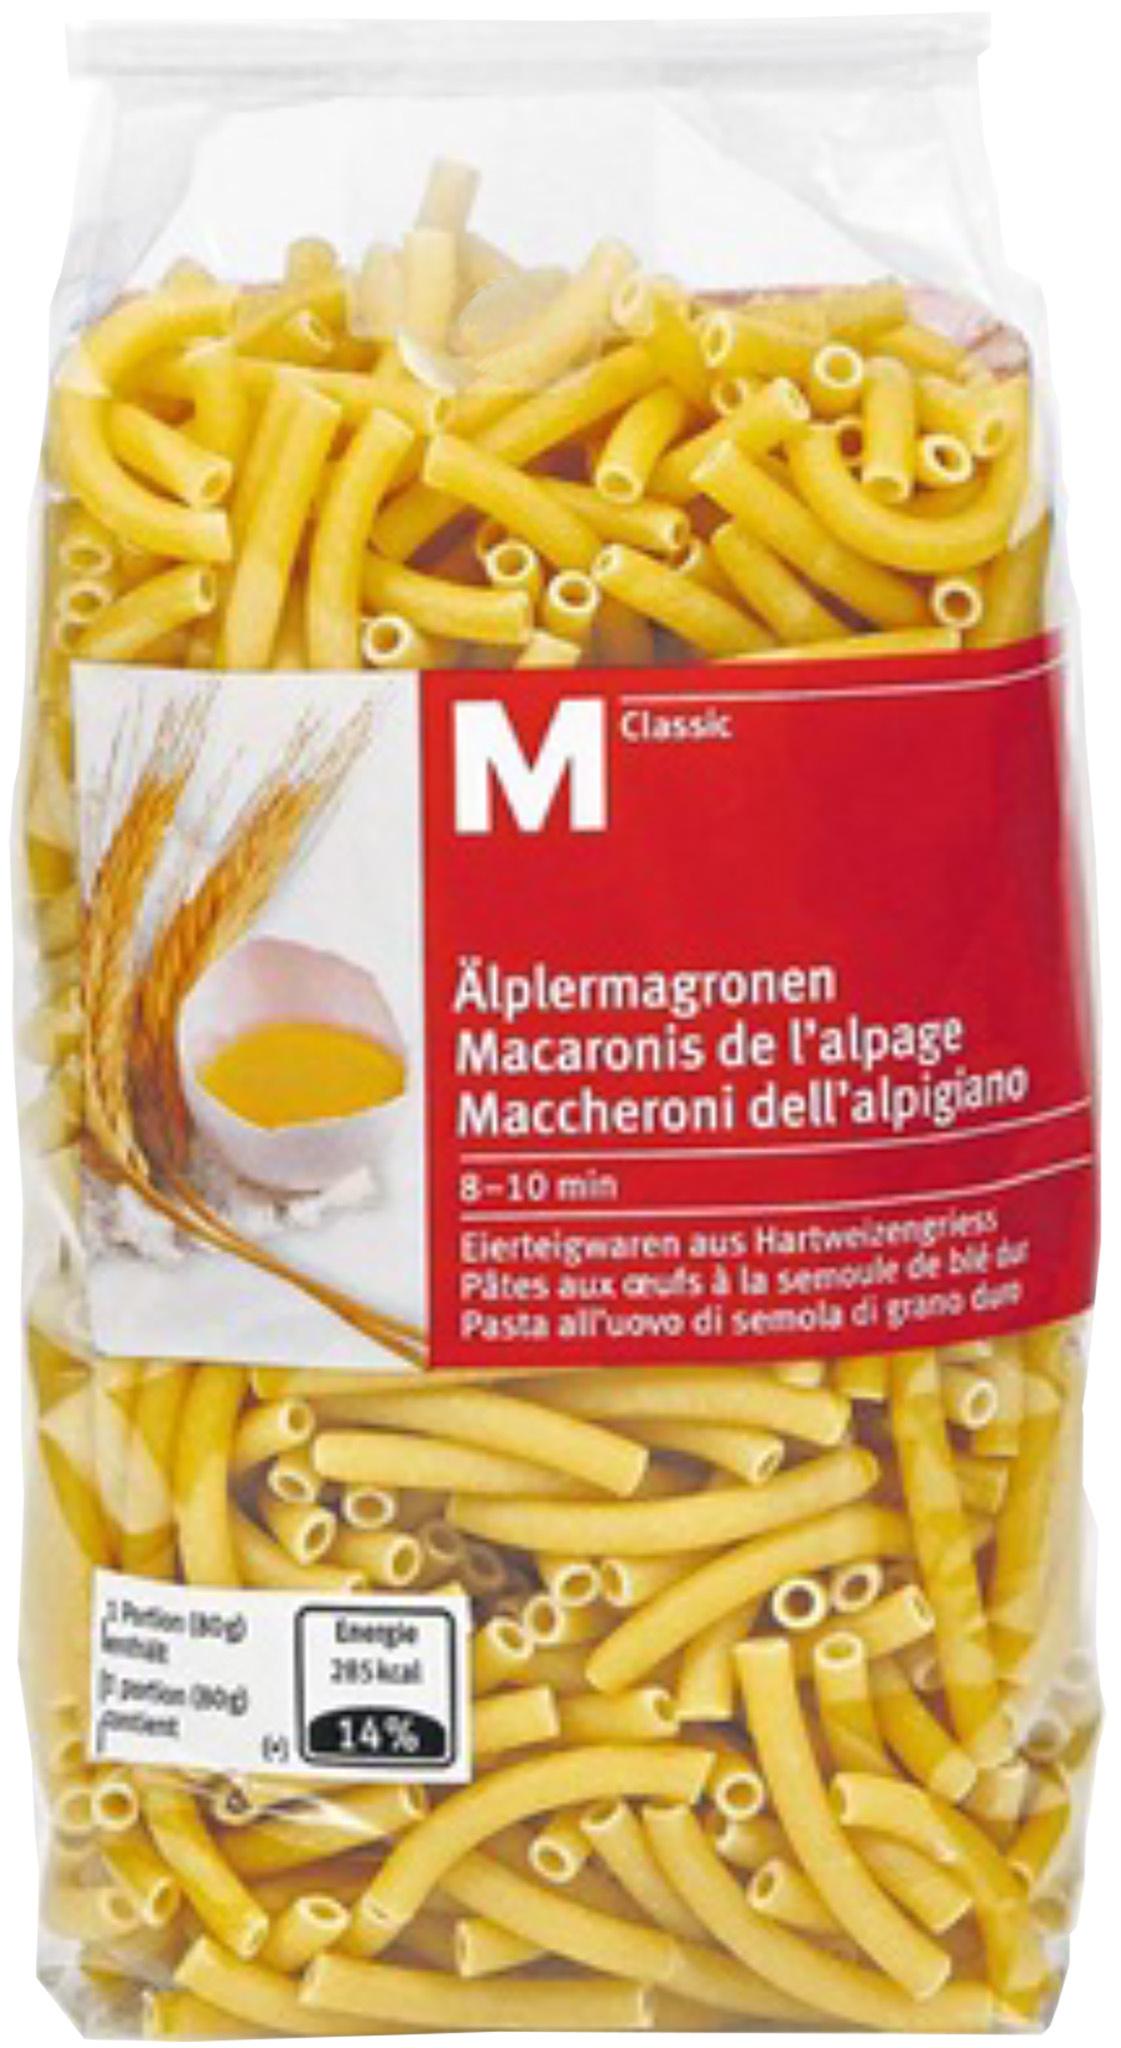 Macaronis de l'alpage - Product